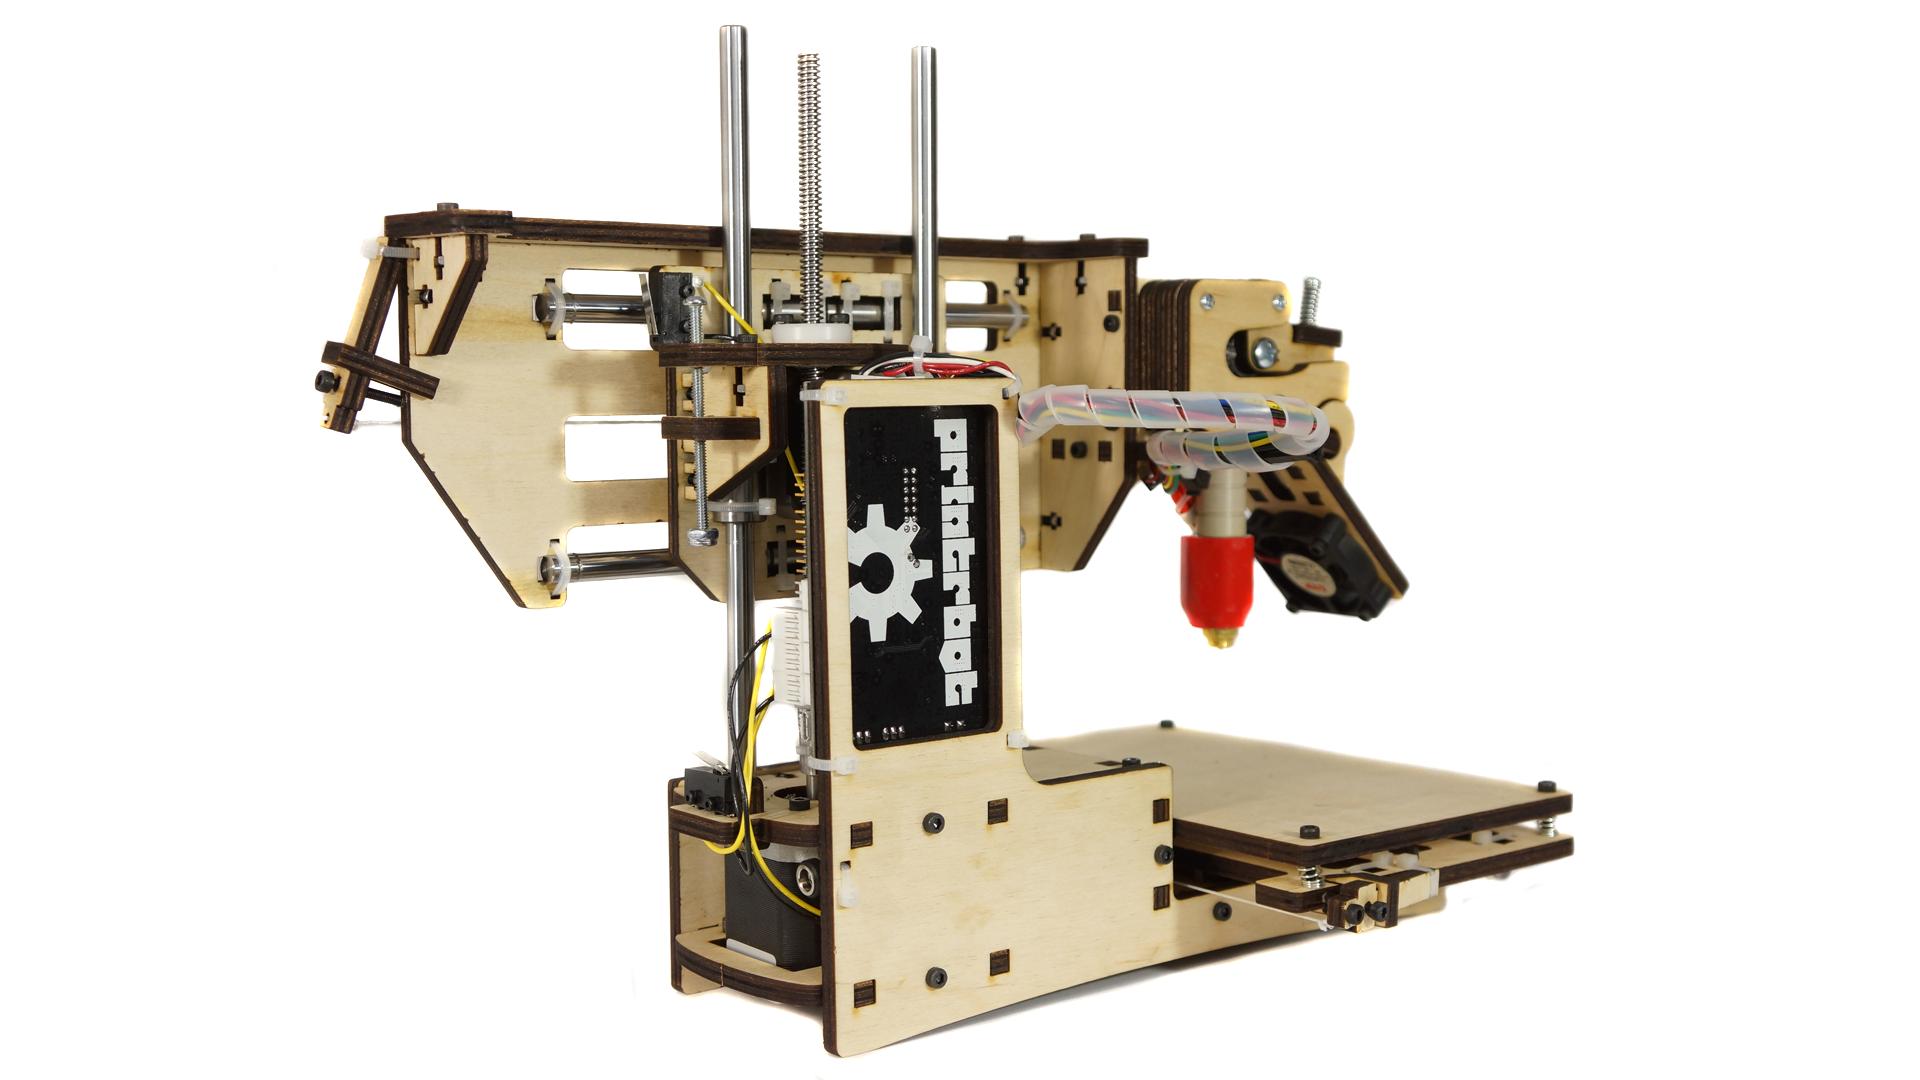 Printrbot Simple 3D Printer